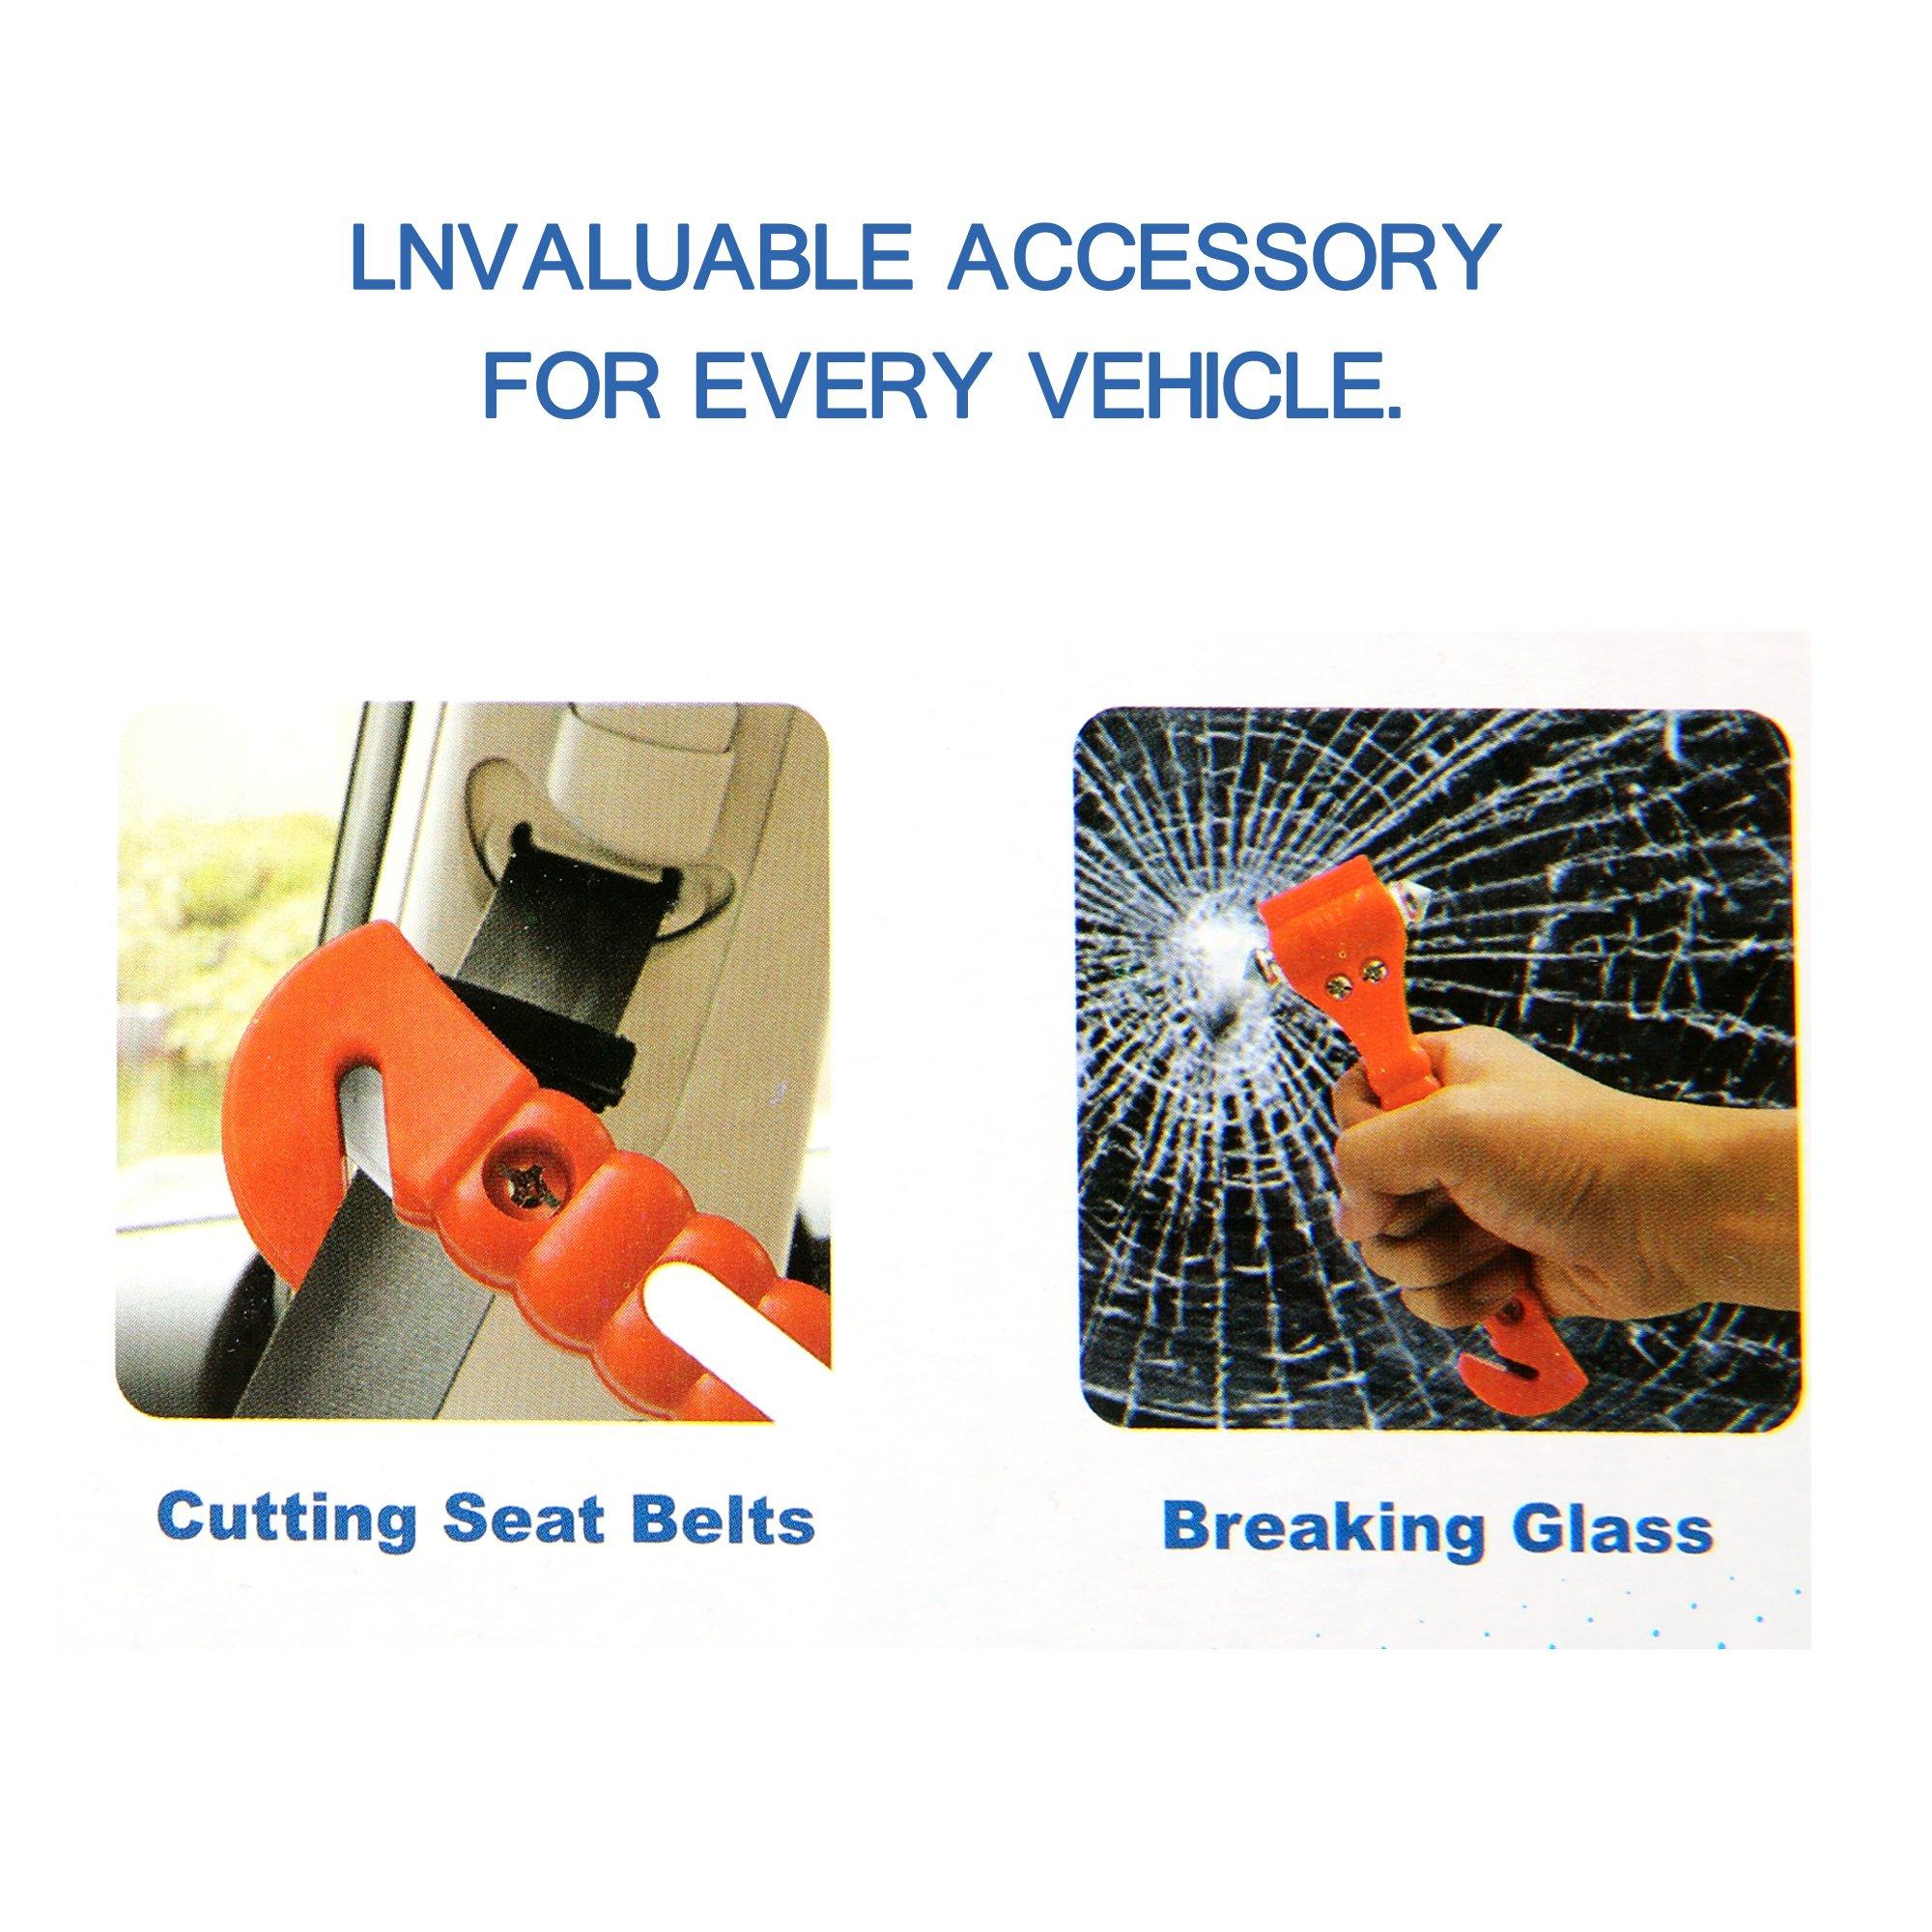 Kindsells Car Auto Emergency Safety Hammer Belt Window Glass Breaker Punch Cutter Bus Escape Rescue Tool Kit Survival Gear